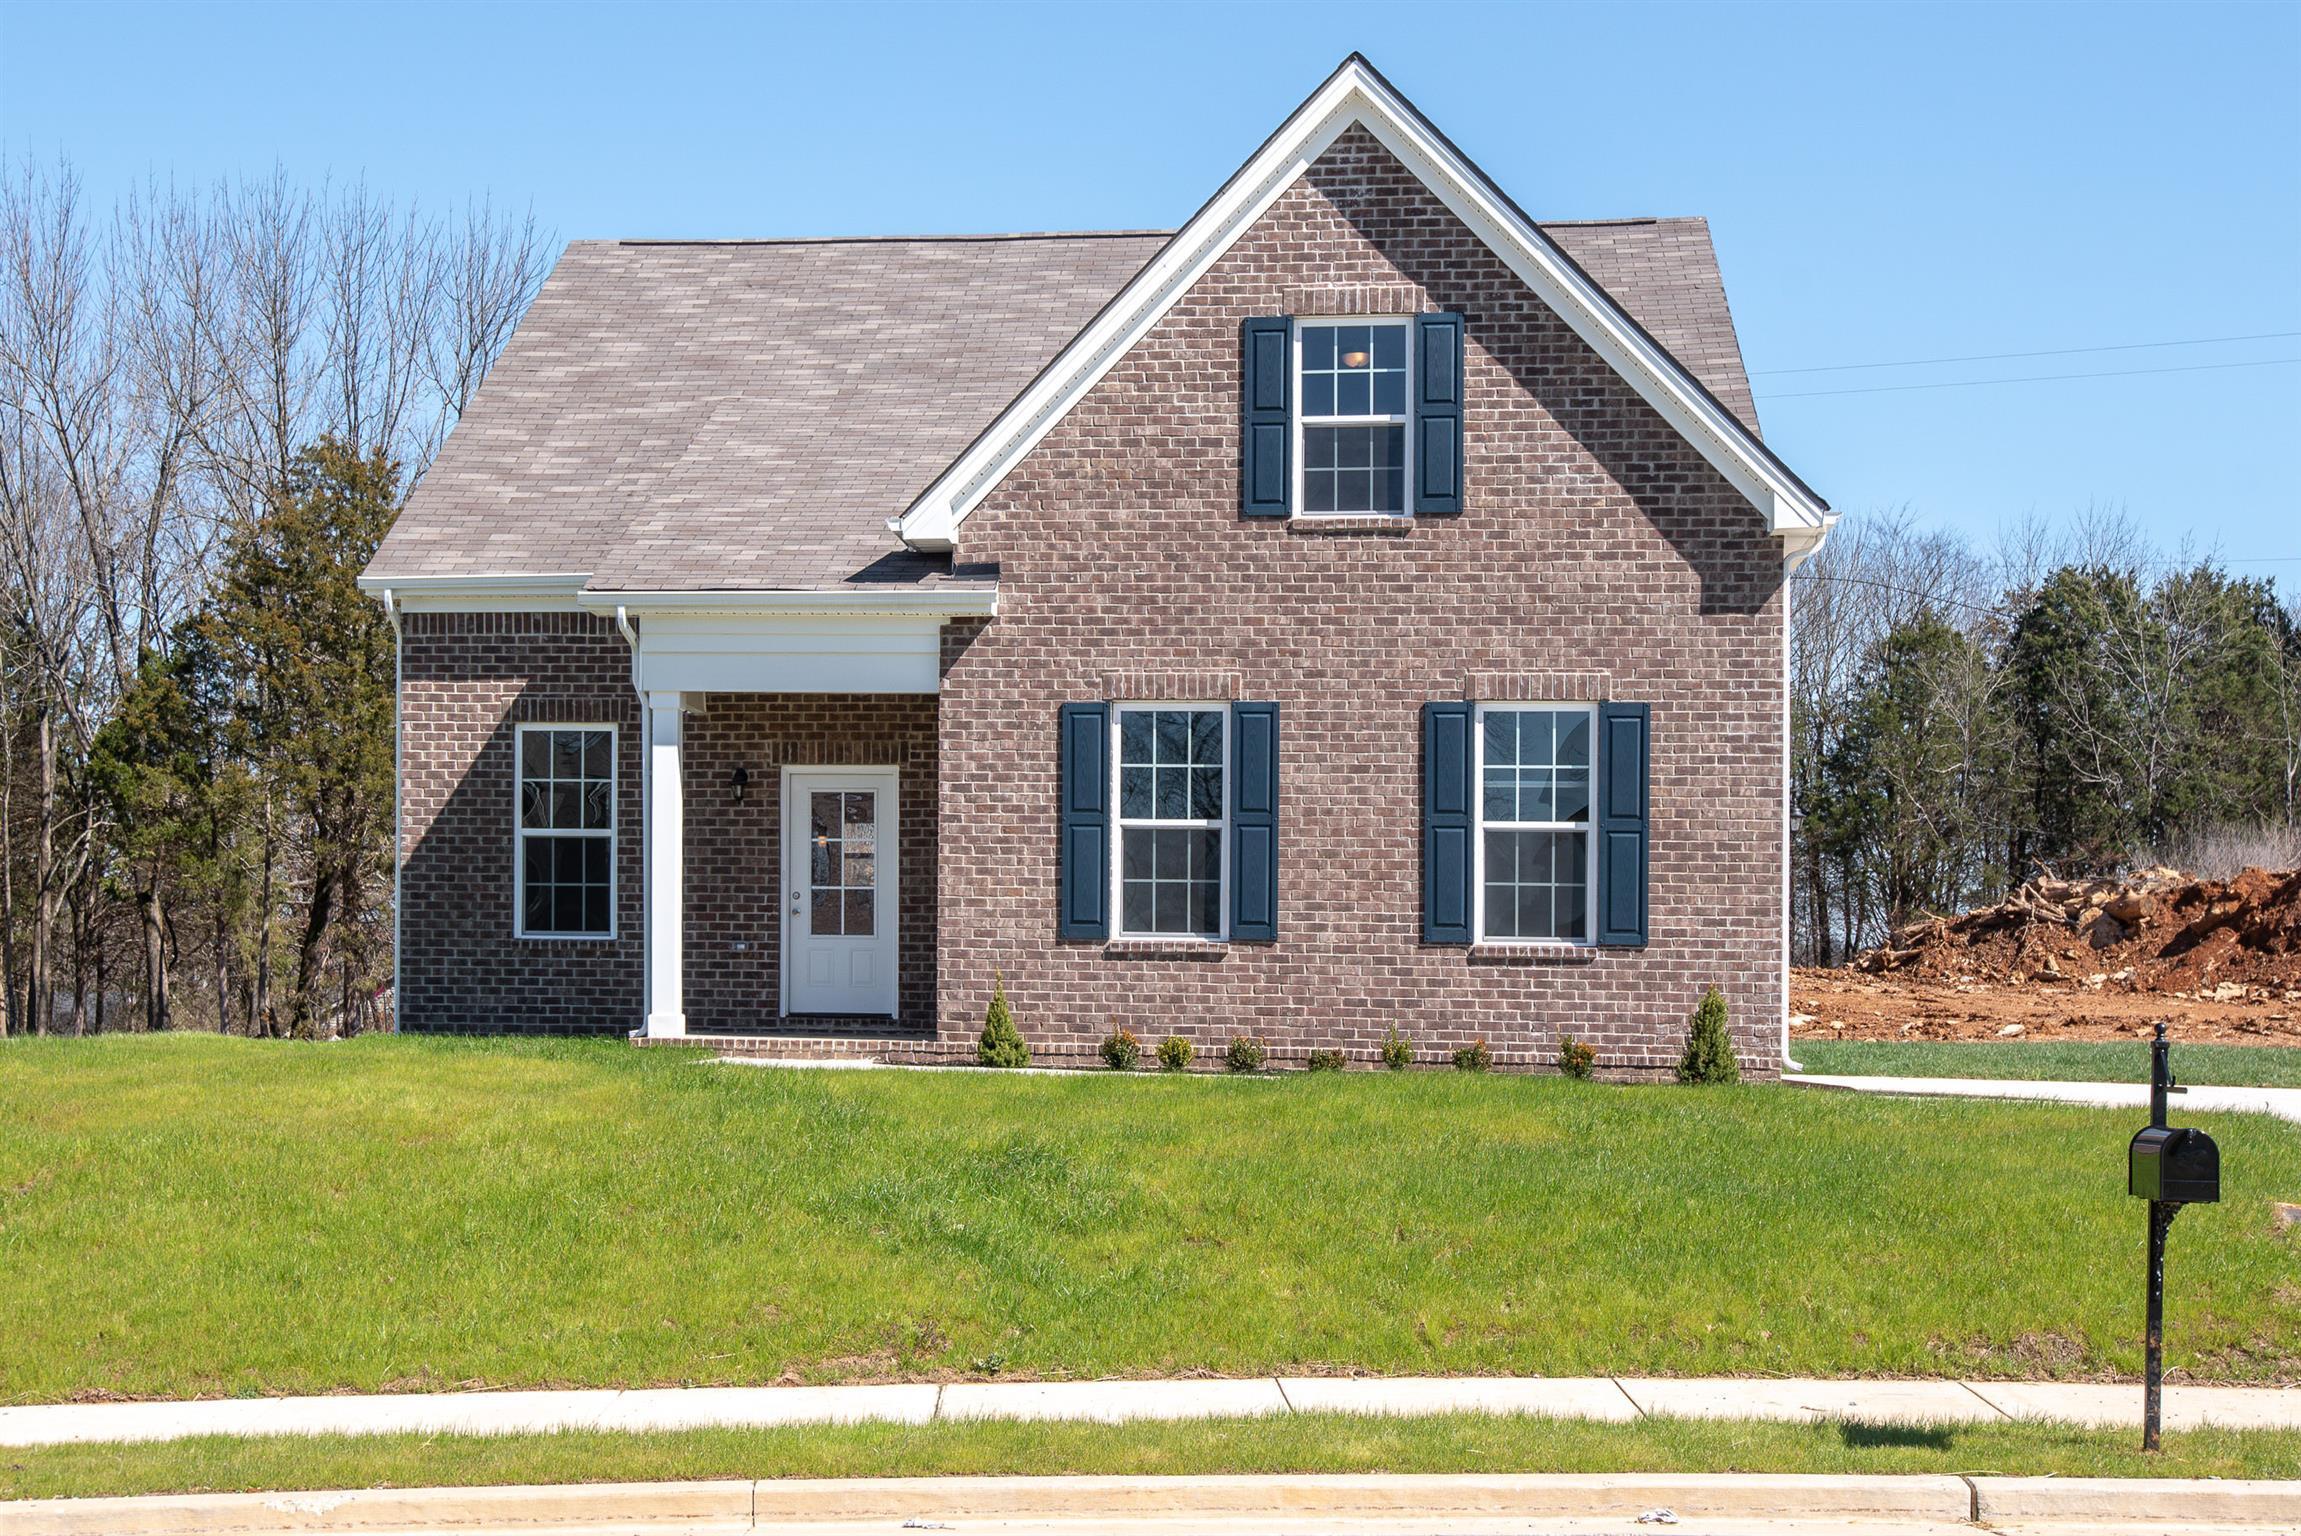 1032 Trevino Pl, Nashville, TN 37217 - Nashville, TN real estate listing